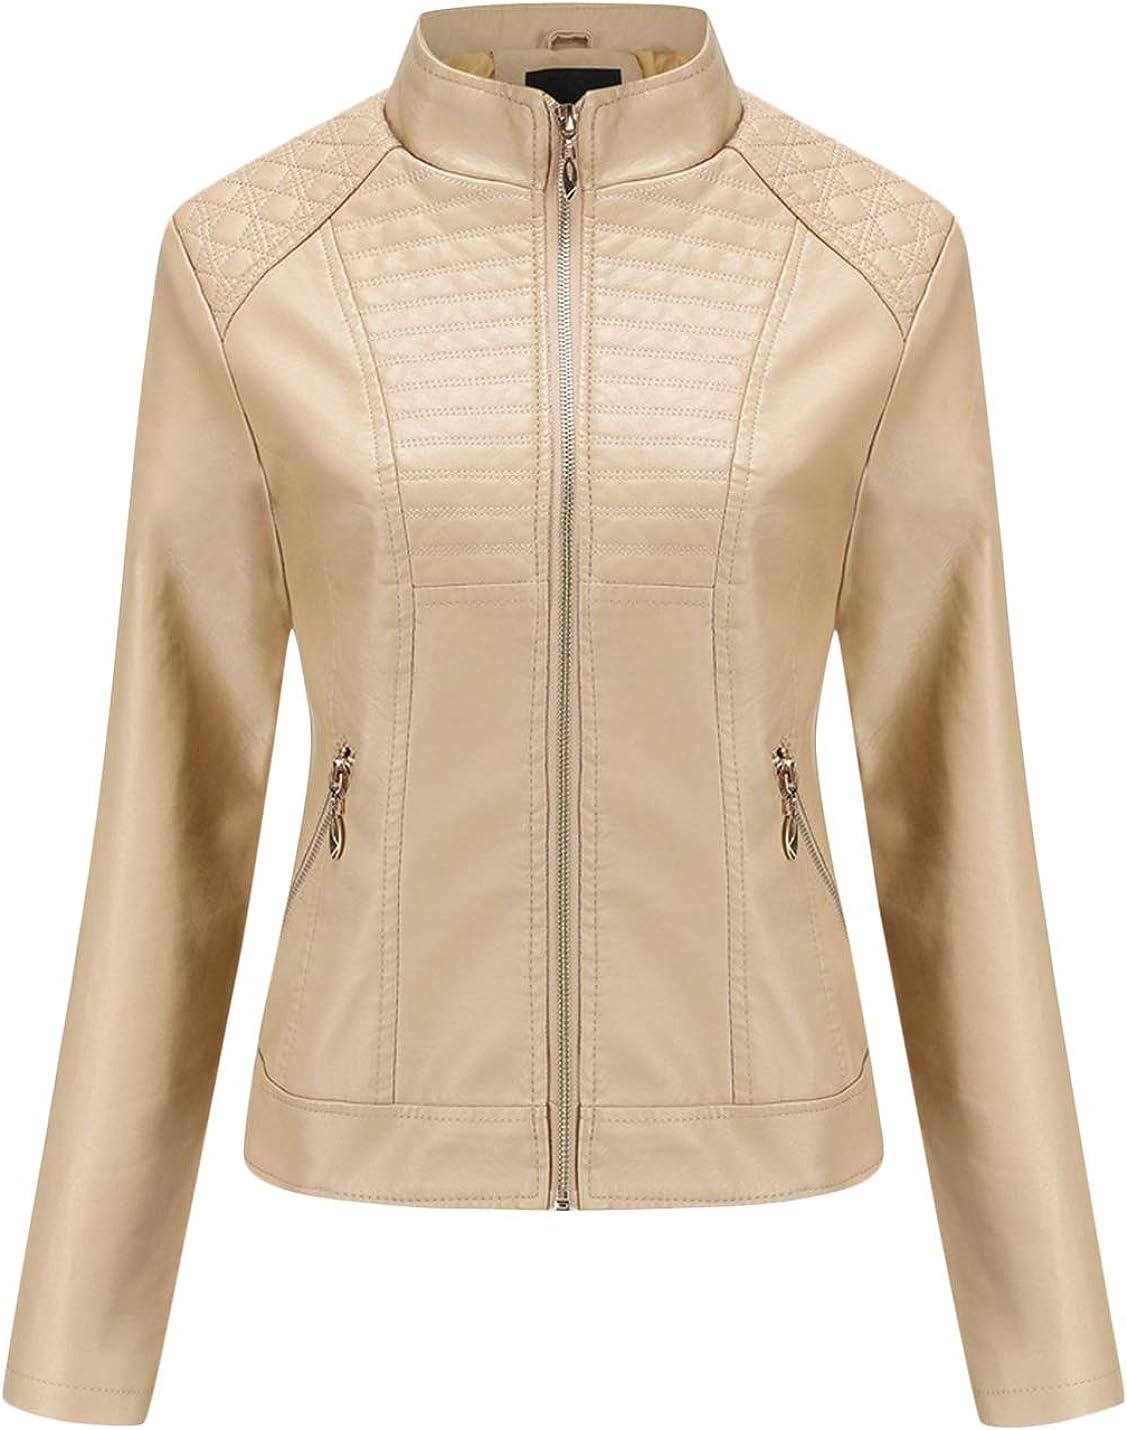 Uaneo Women's Stand Collar Zip Up PU Leather Moto Biker Short Bomber Jacket (Large, Khaki)